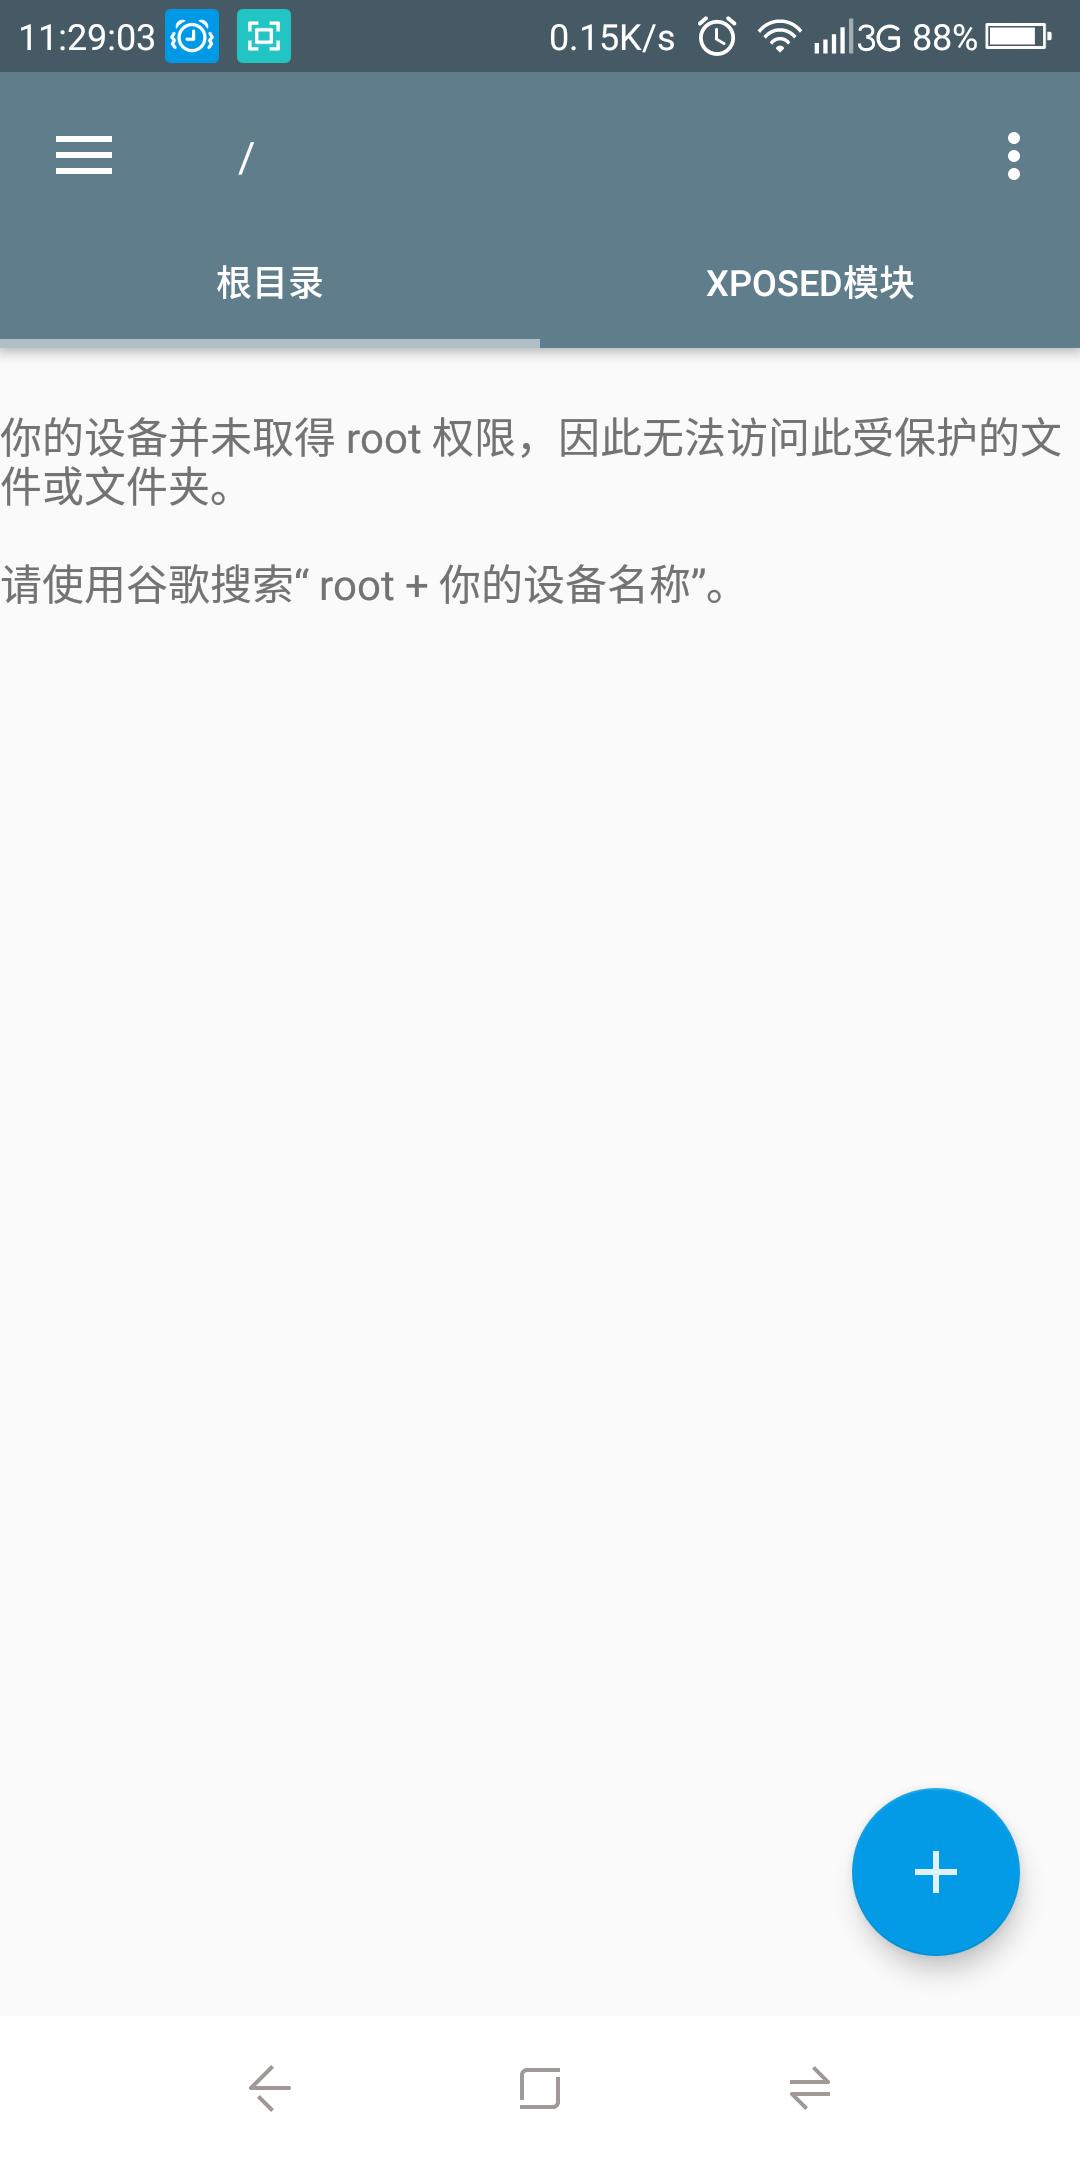 Screenshot_2018-11-20-11-29-05.png